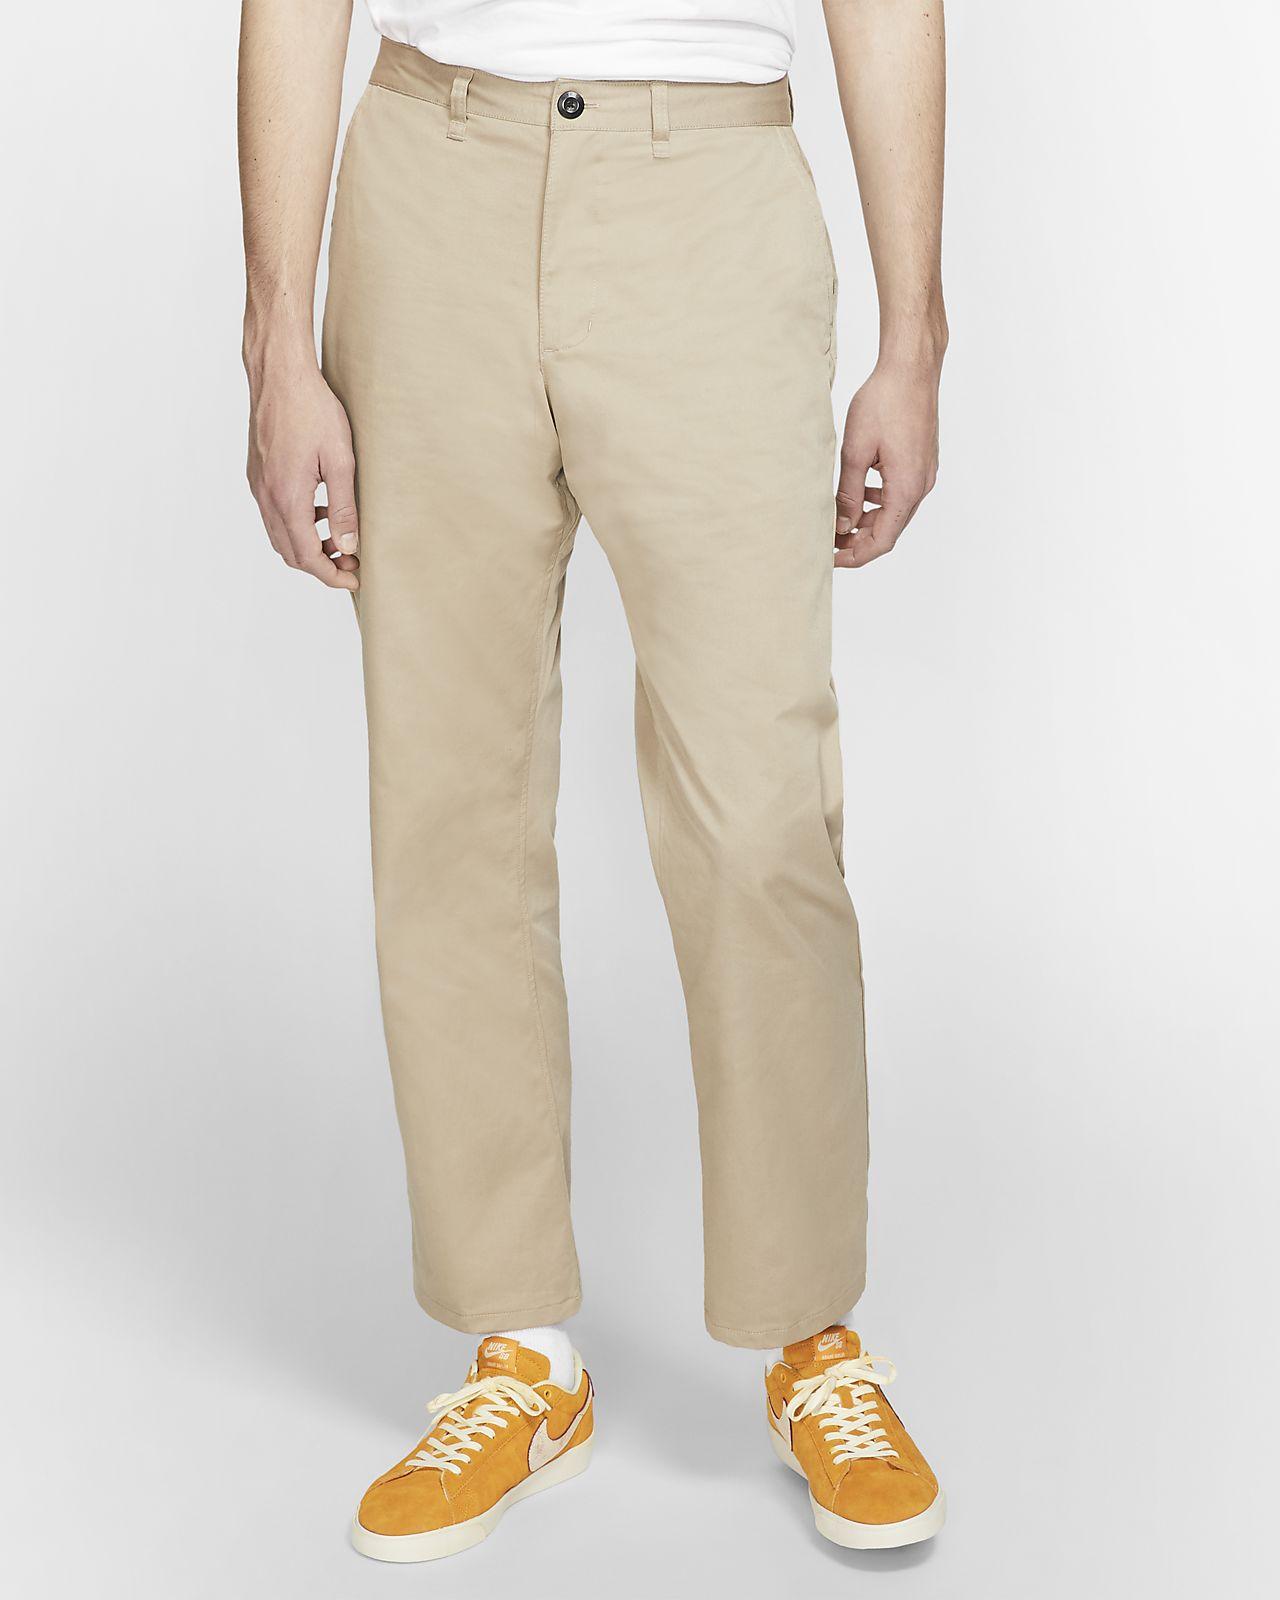 41b44adff08 Nike SB Dri-FIT FTM Men's Loose Fit Trousers. Nike.com LU